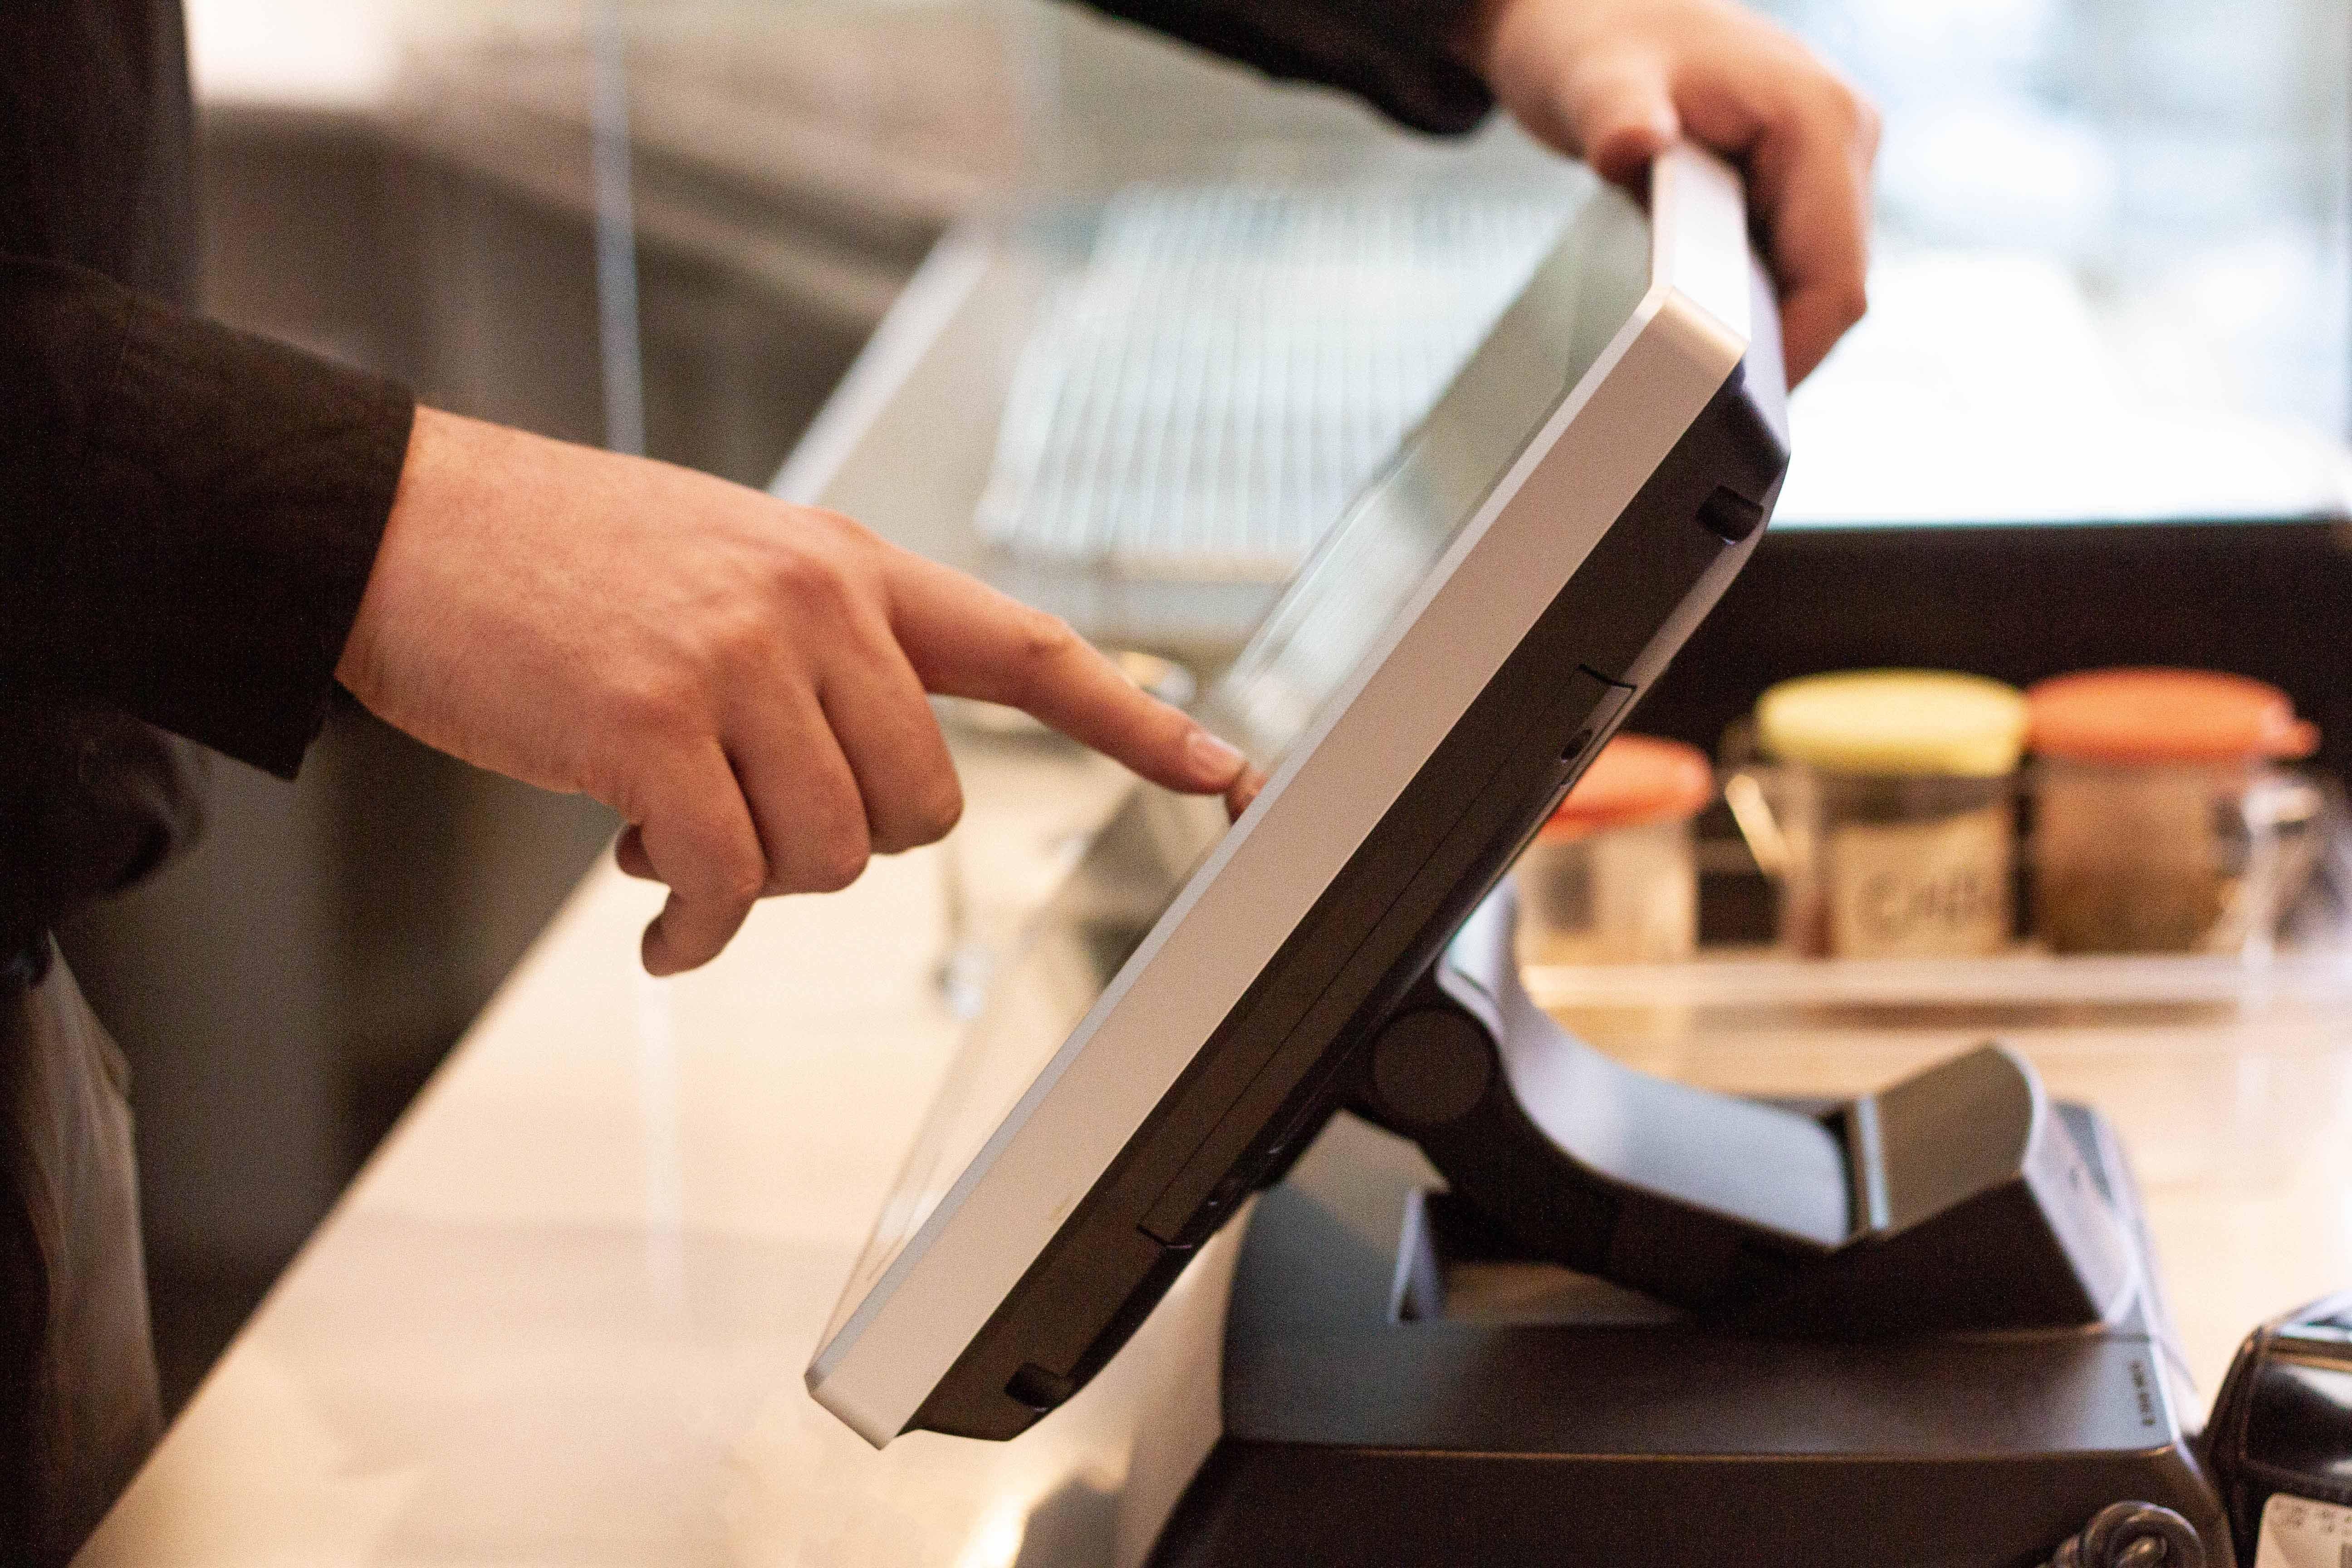 Pizzeria employee using a touchscreen POS display